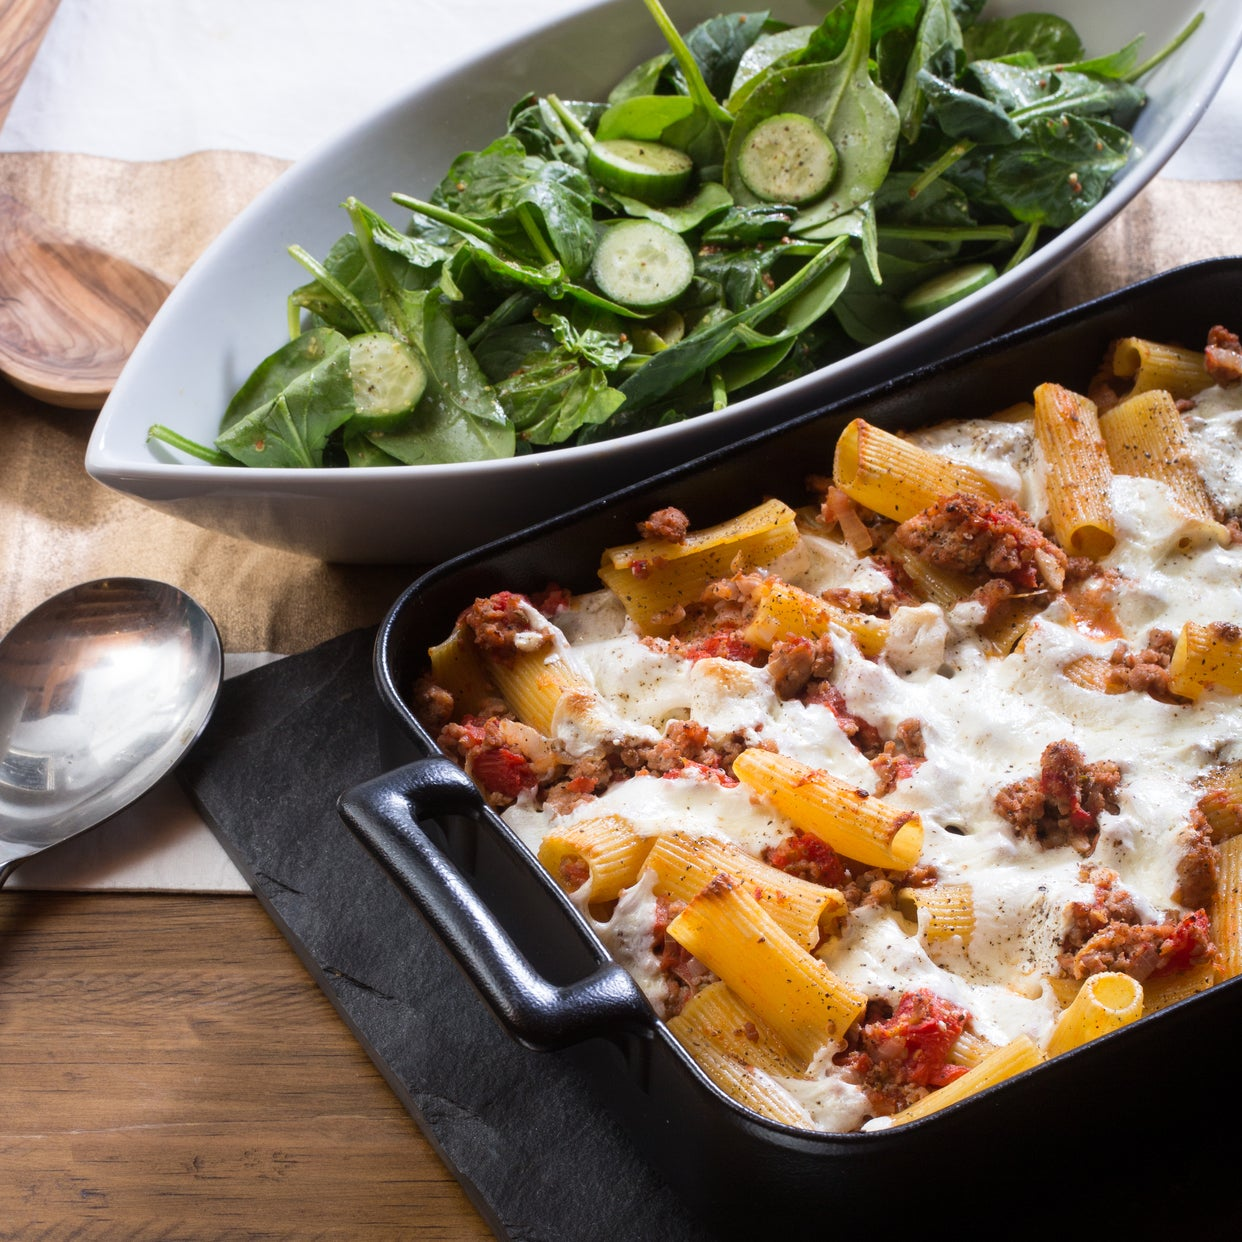 Spiced Pork & Baked Rigatoni Pasta with Fresh Mozzarella & Spinach Salad